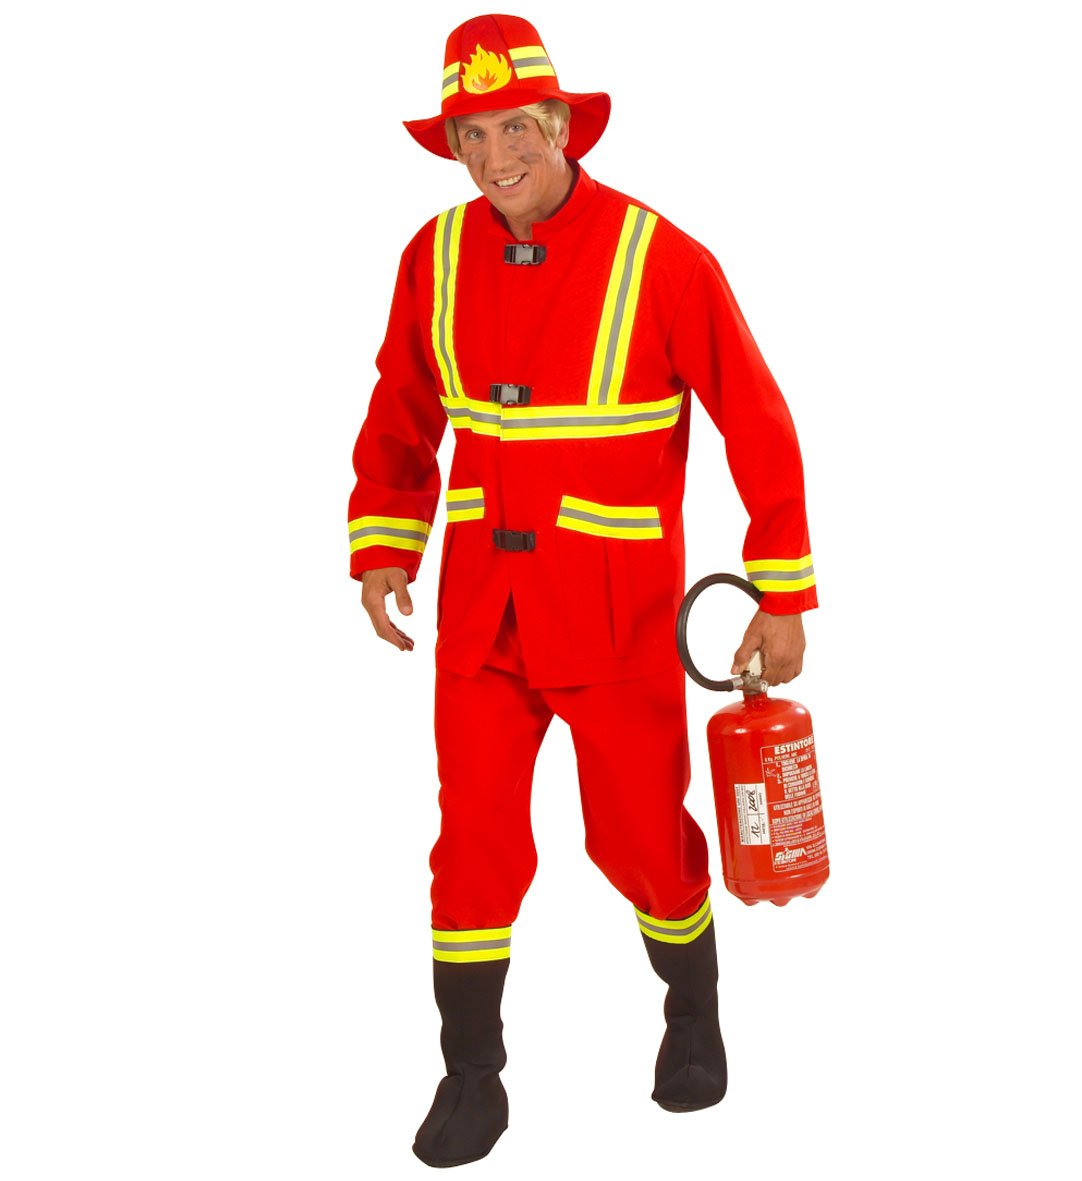 Kostüm Karneval Herren Anzug Feuerwehrmann  22830, 22830, 22830, mehrfarbig L a38278